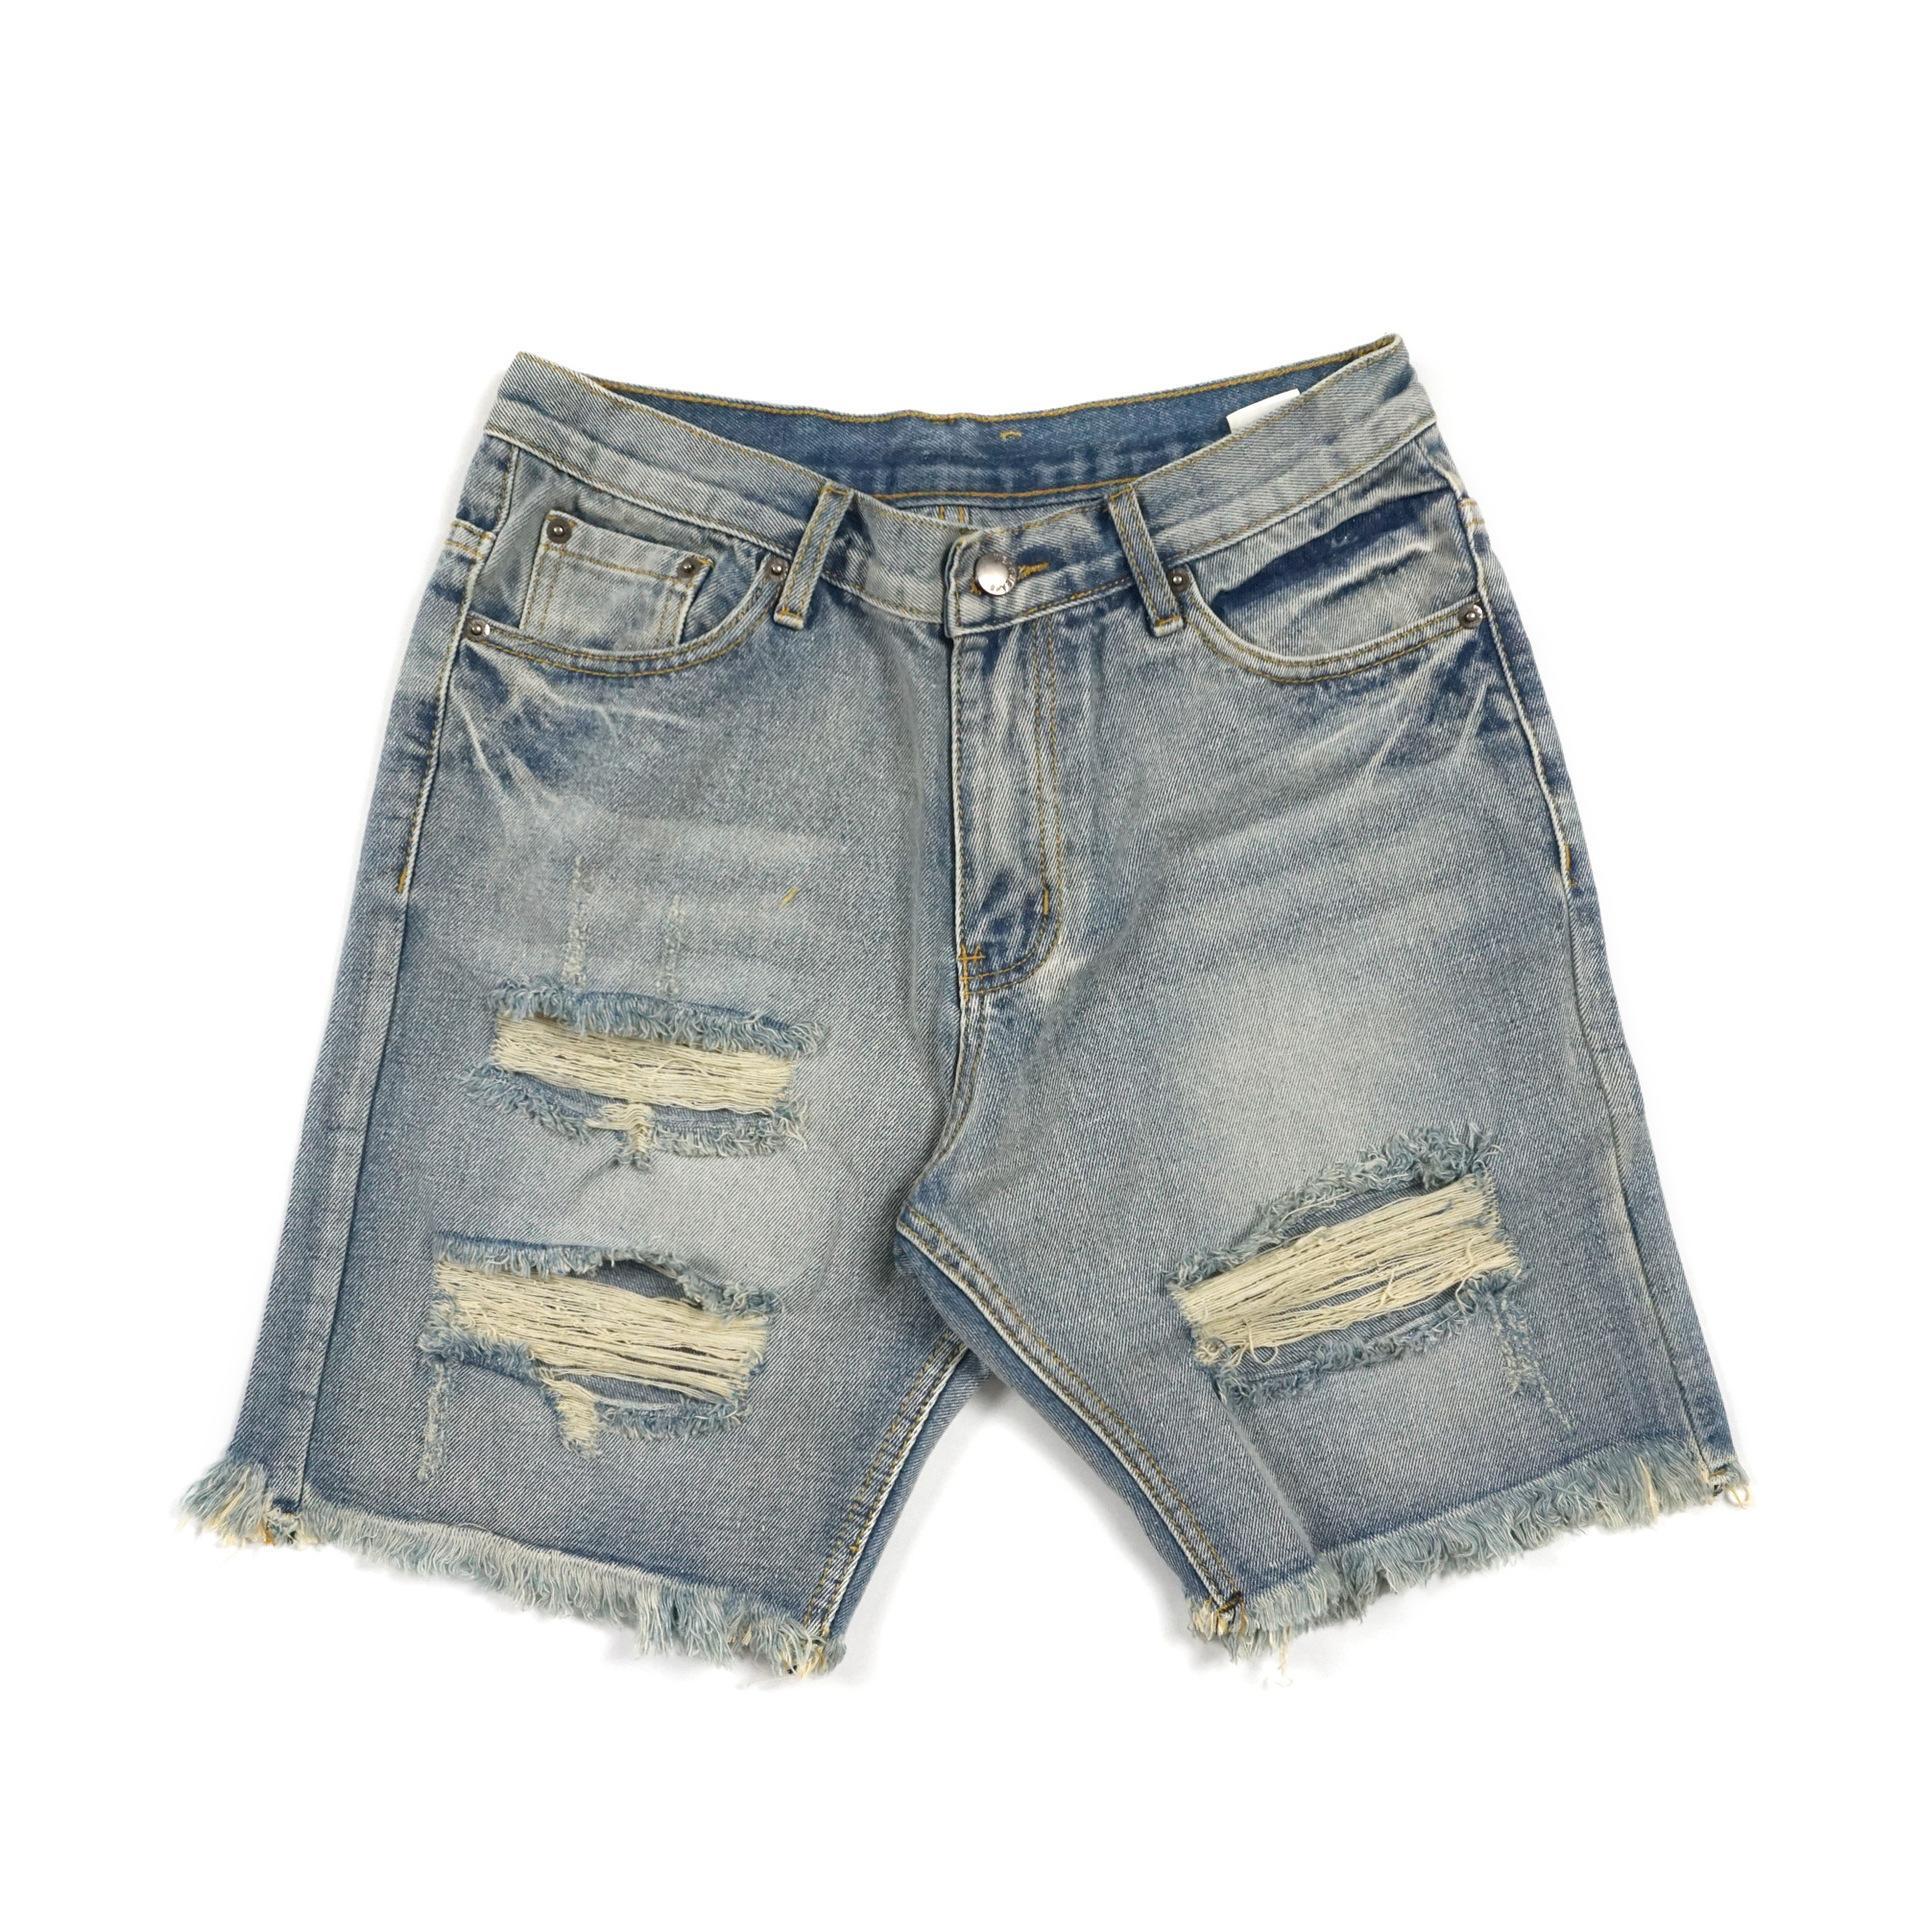 Luxury Beach Брюки мужские New Fashion Designer Шорты Повседневная Solid Color Board Shorts Оригинал High Street Нищий Hole Wash Denim шорты